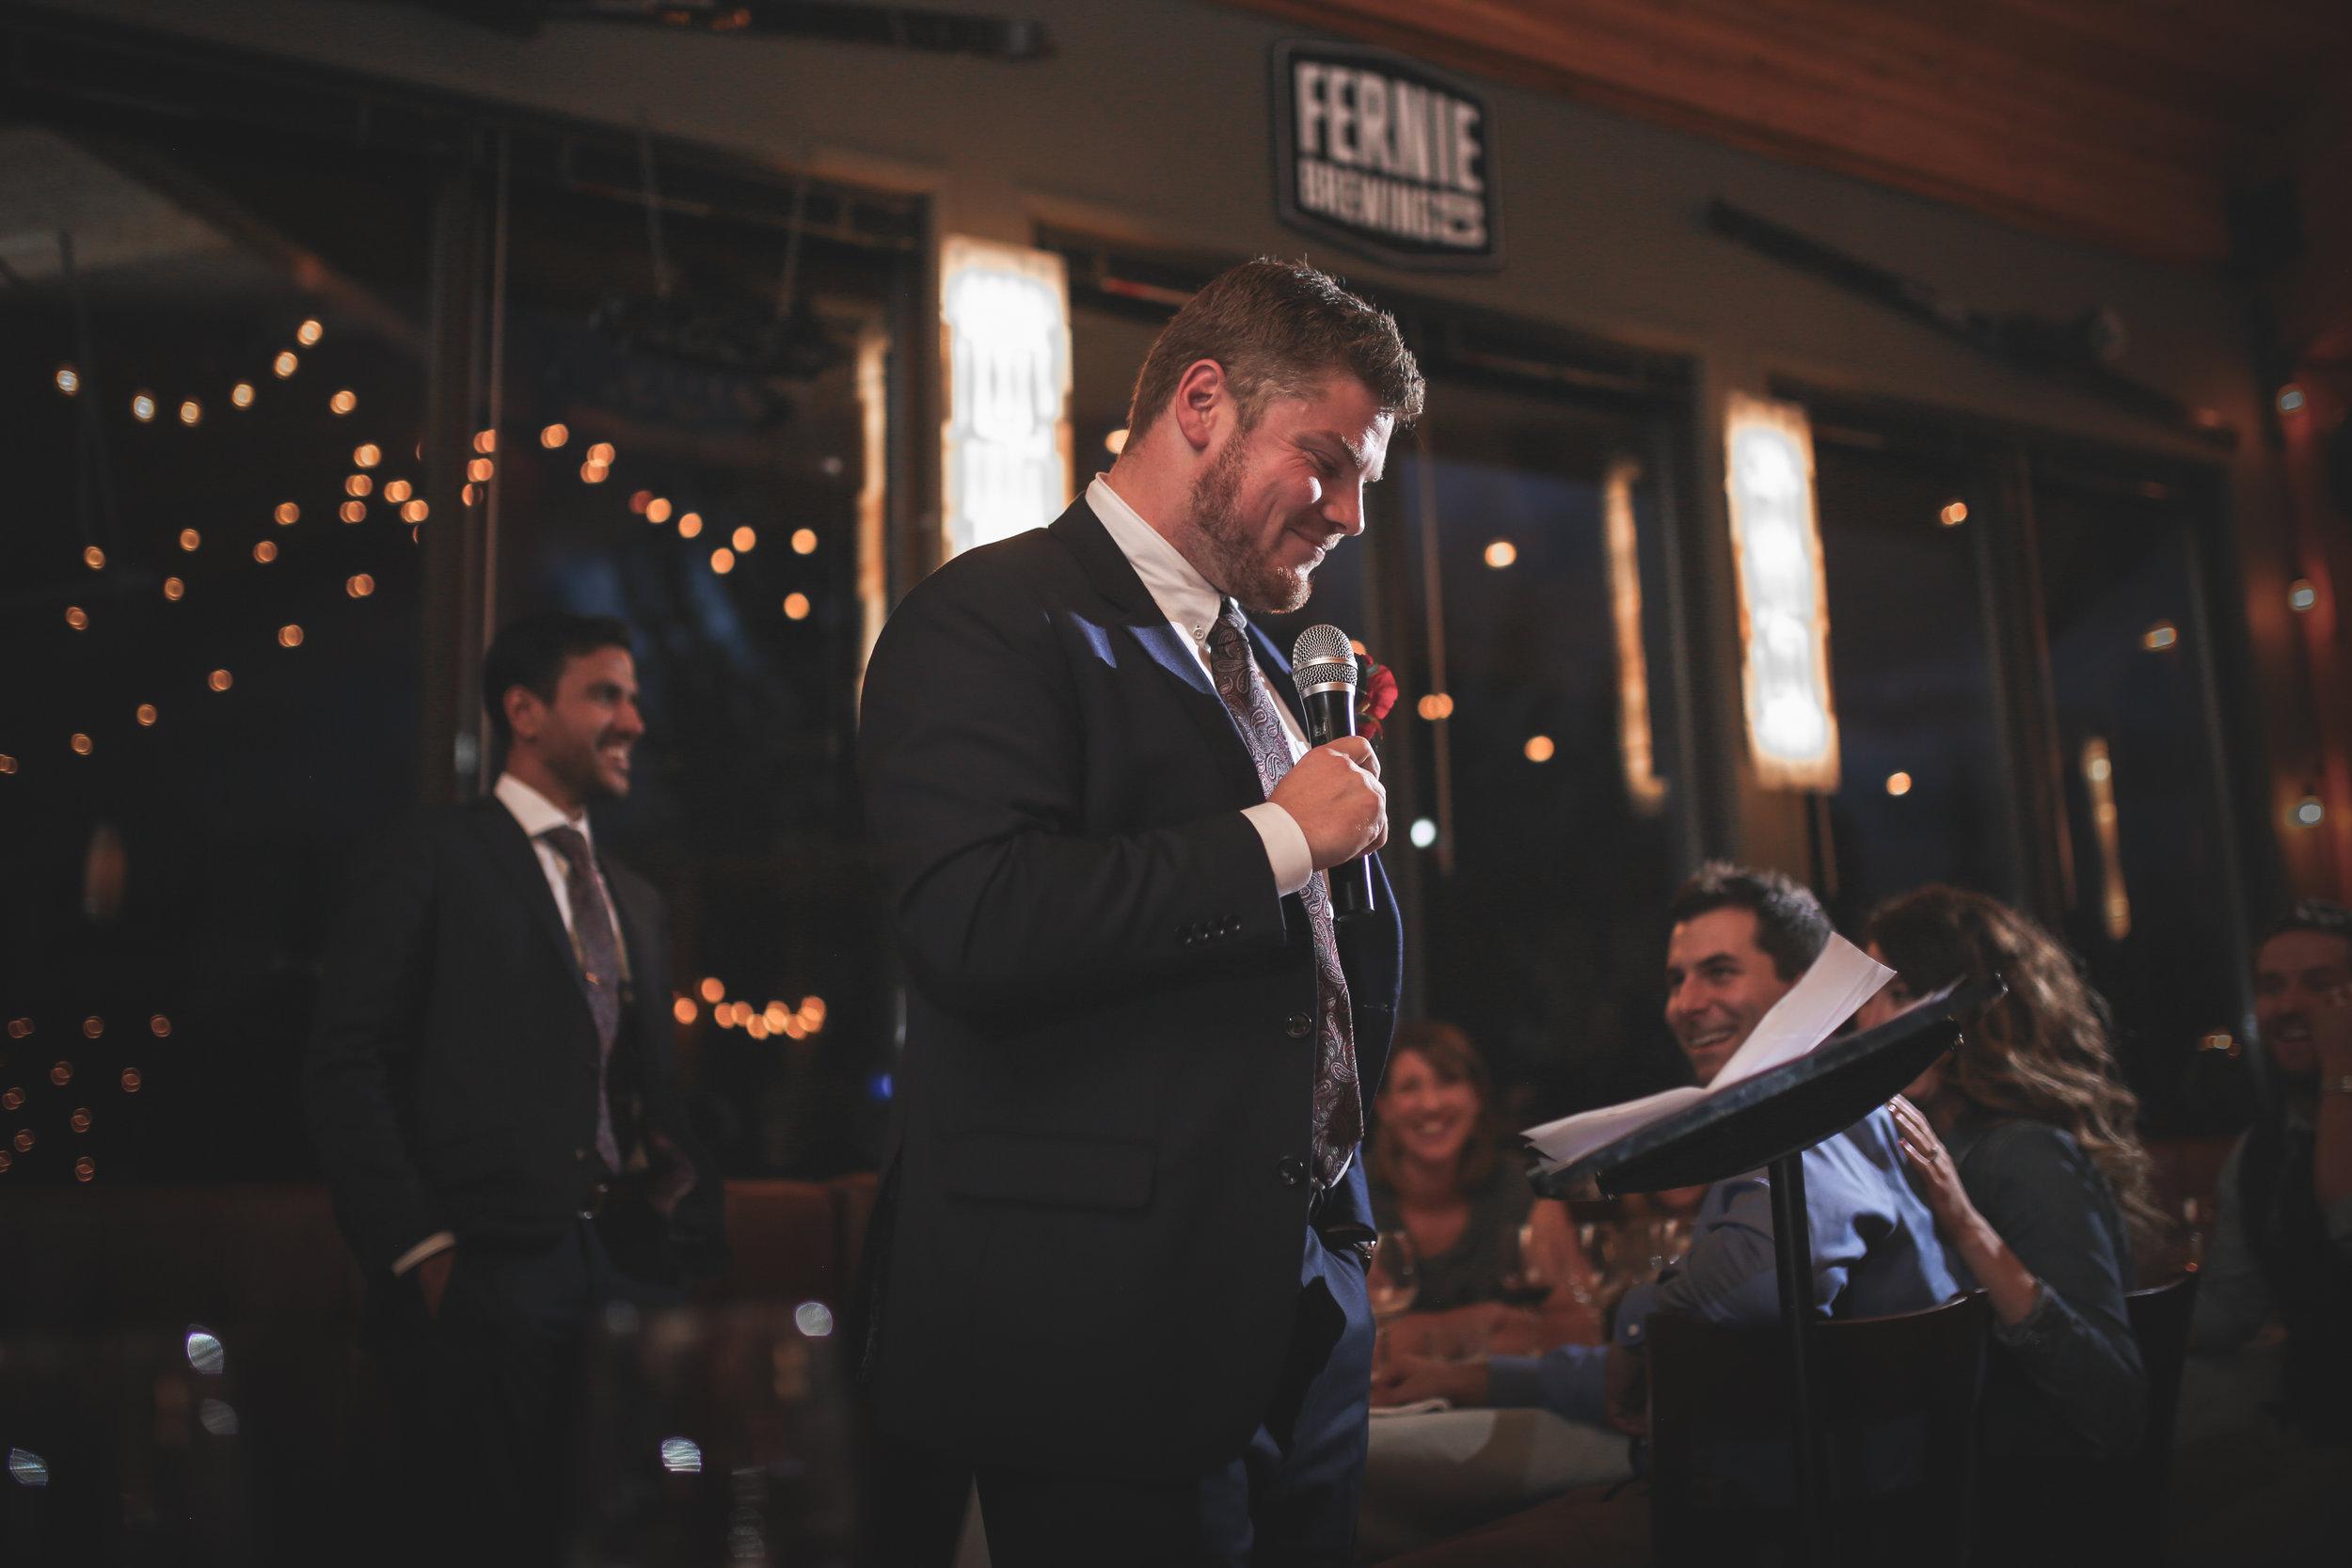 62 Adam Ziorio Photography - Vitoria wedding photographer Nick&Bree Fernie Wedding.jpg